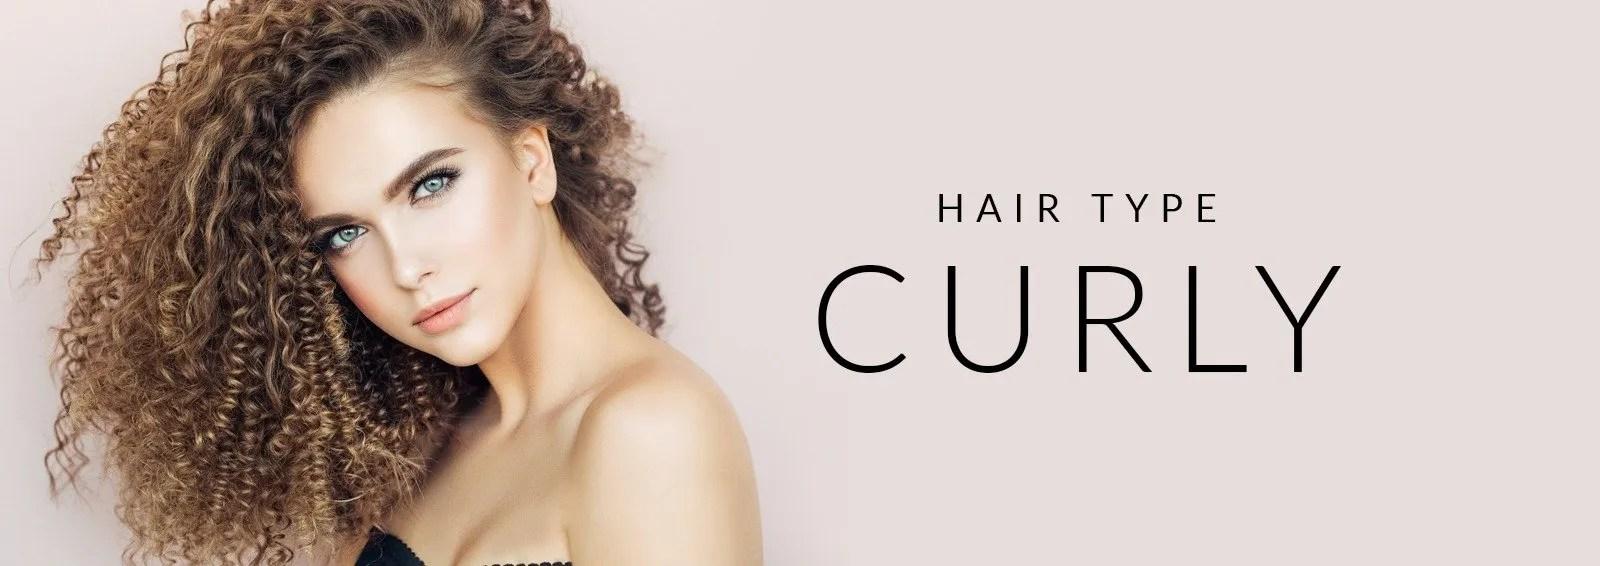 HairType Headers Curly